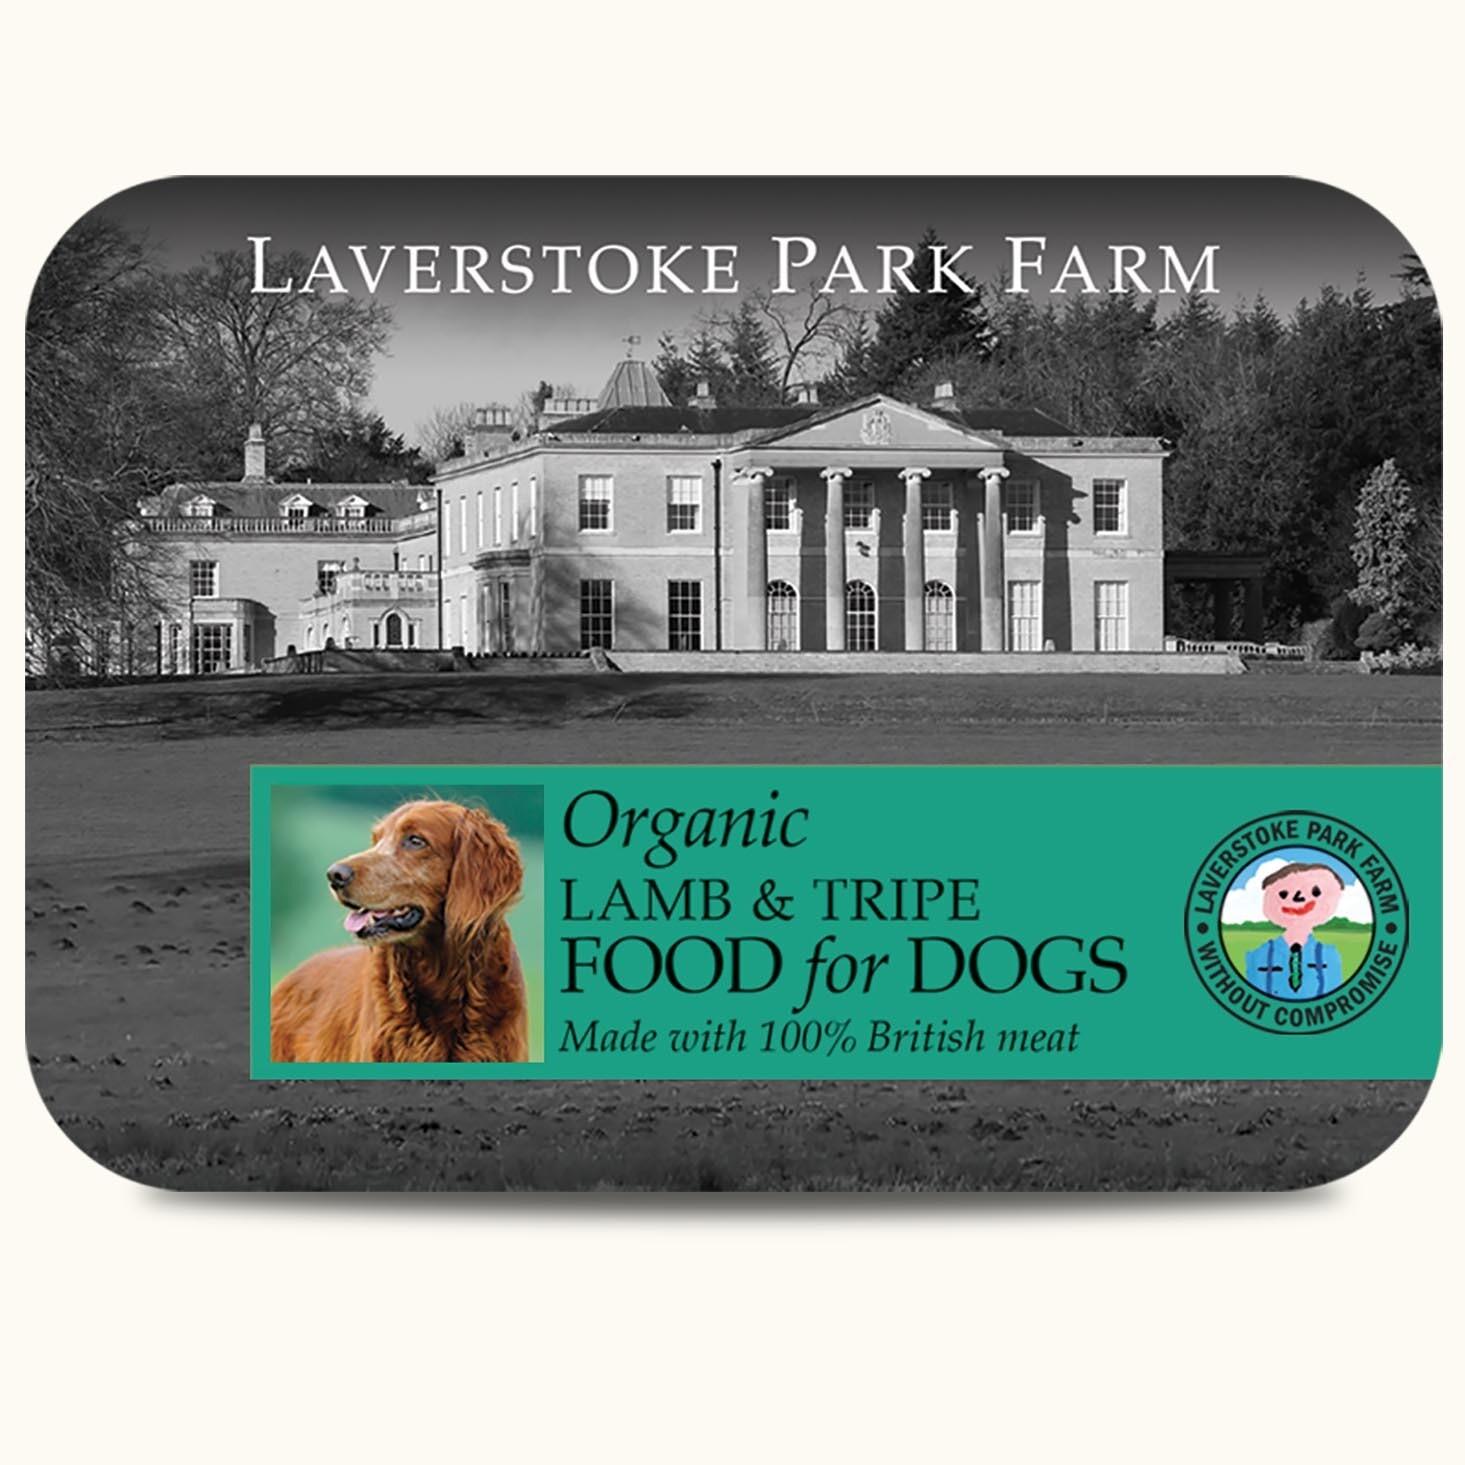 Laverstoke Organic Lamb and Tripe - 500g